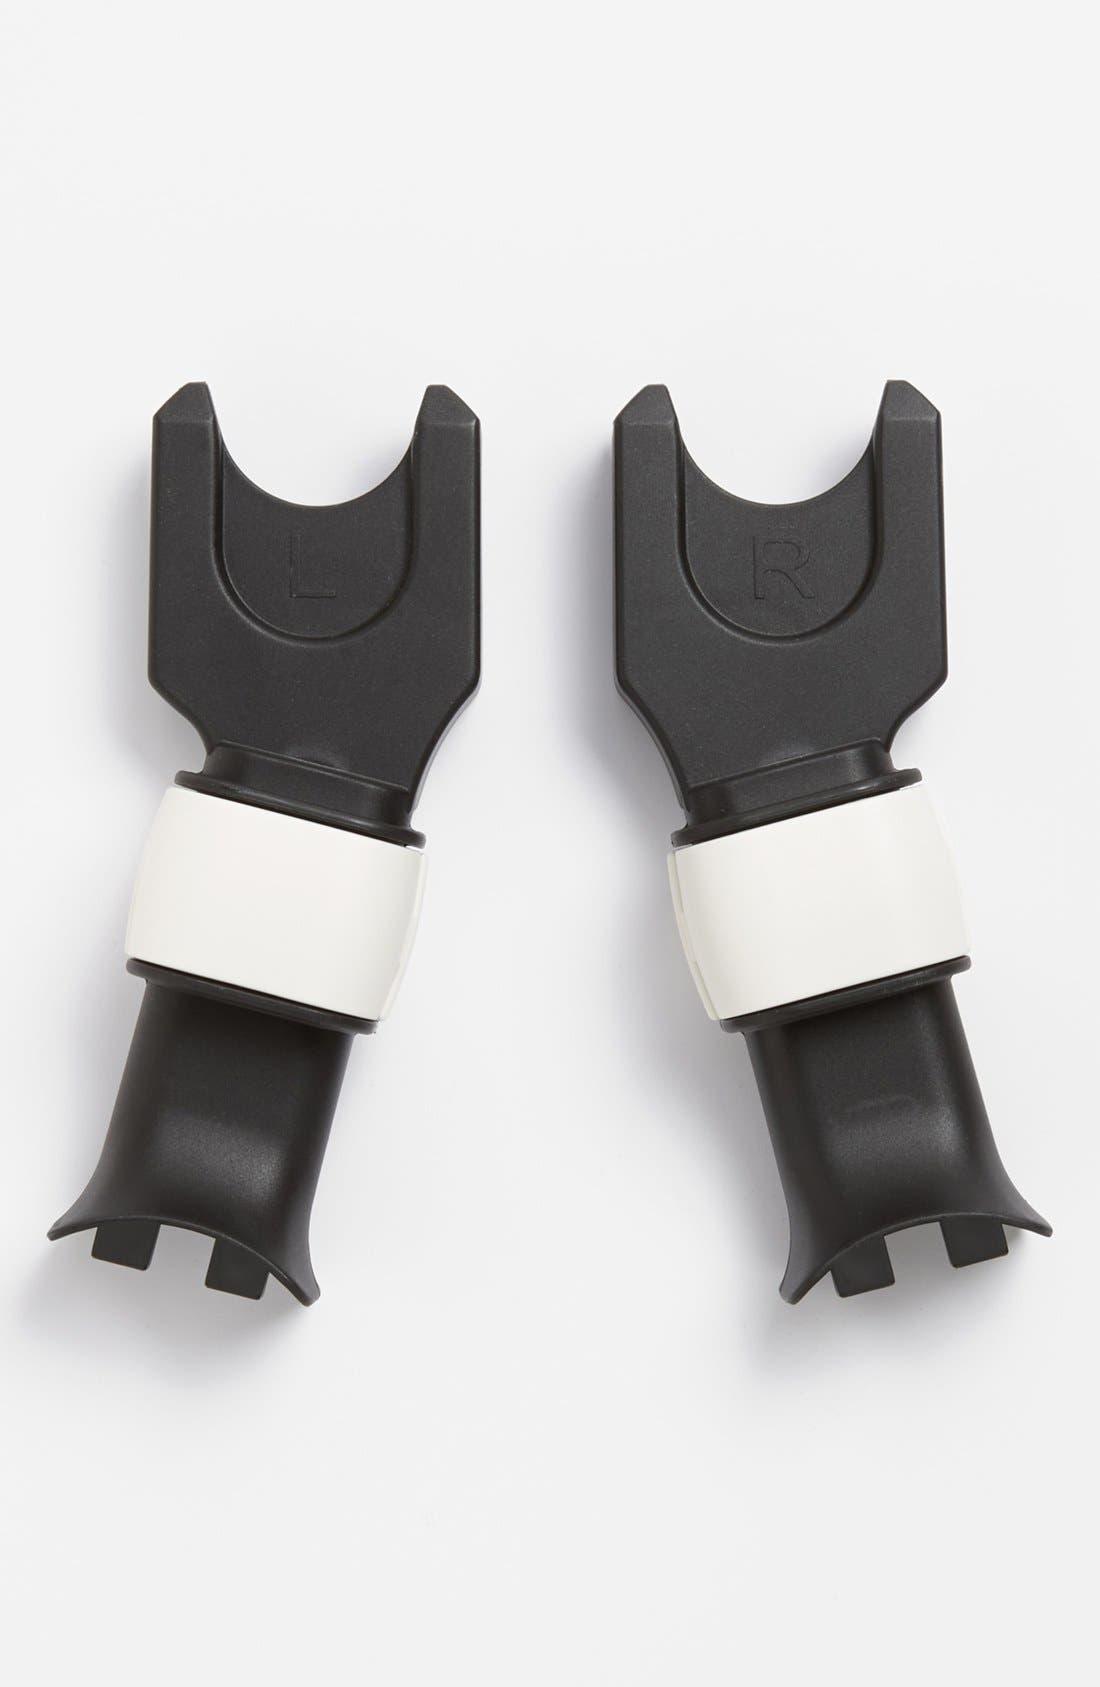 Main Image - Bugaboo 'Cameleon' Maxi-Cosi® Car Seat Adaptors